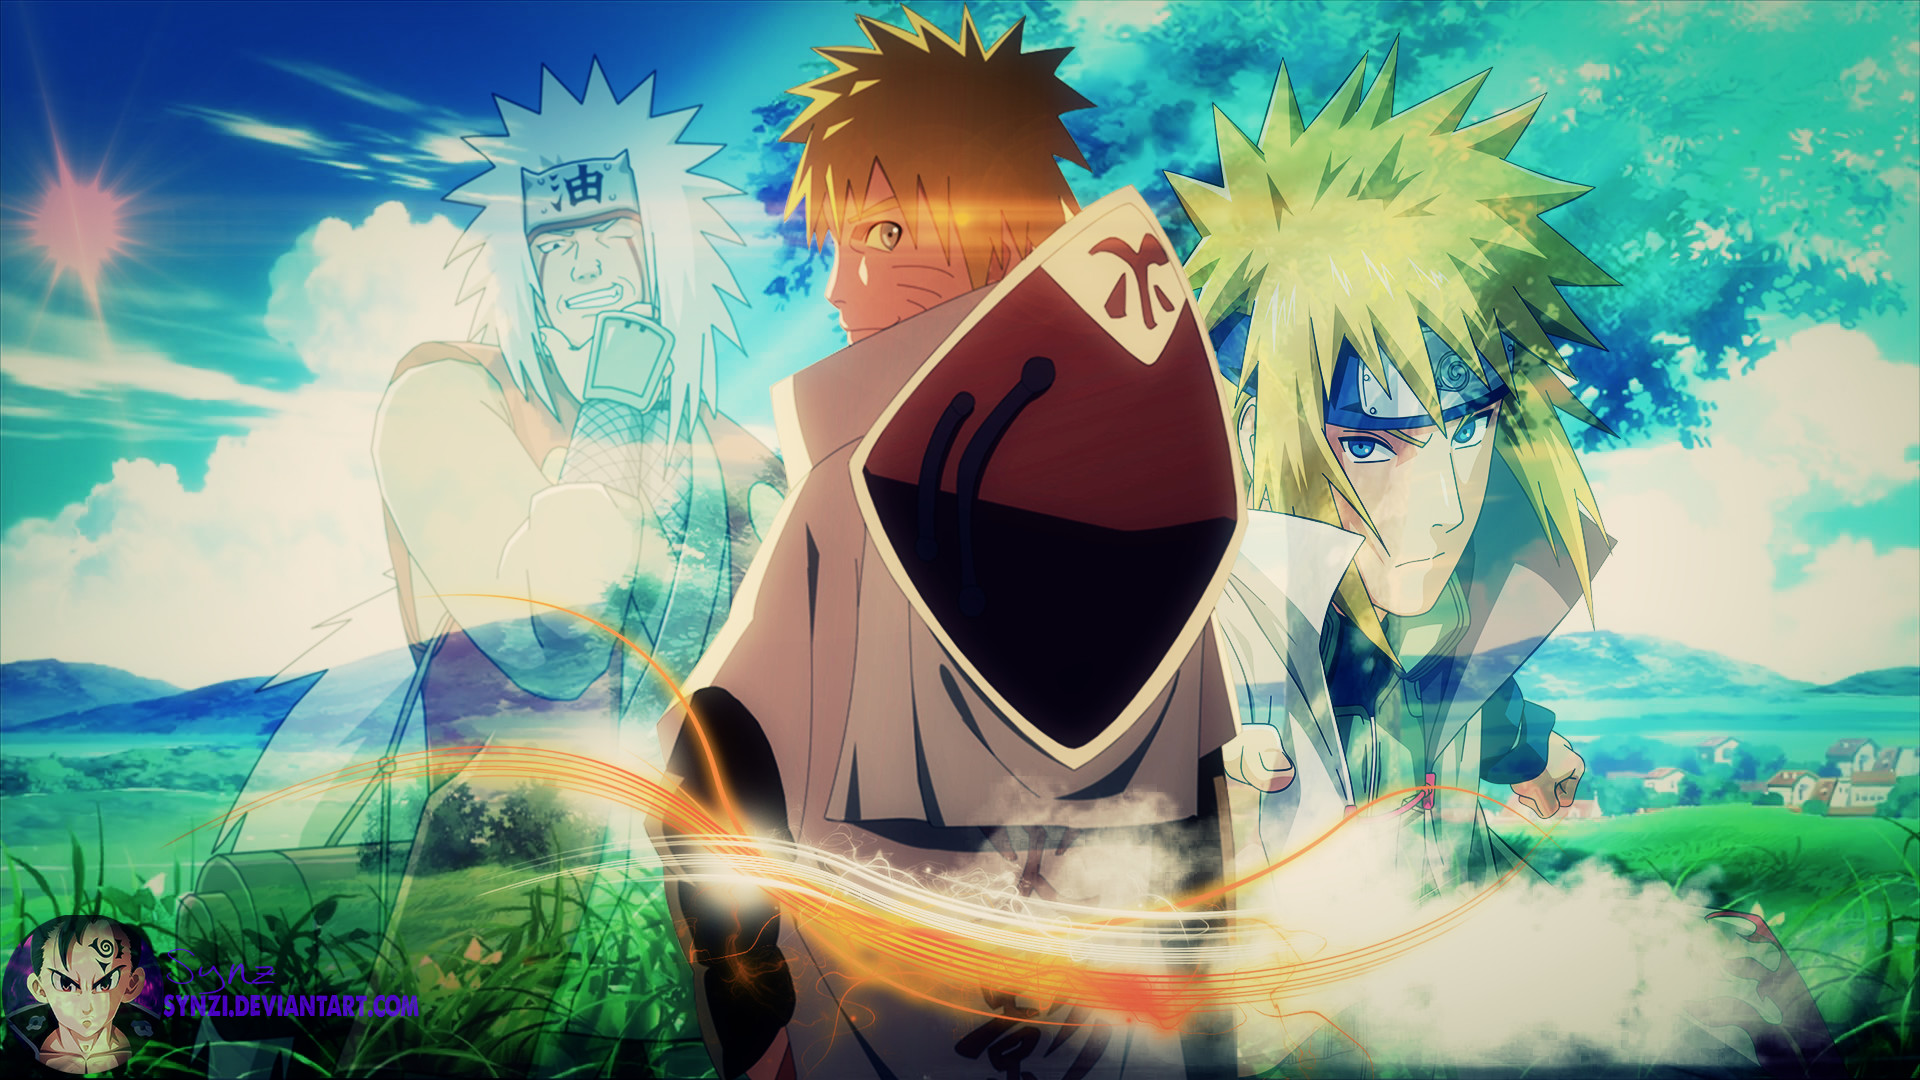 Res: 1920x1080, Naruto, Jiraiya and Minato by SynZi on DeviantArt